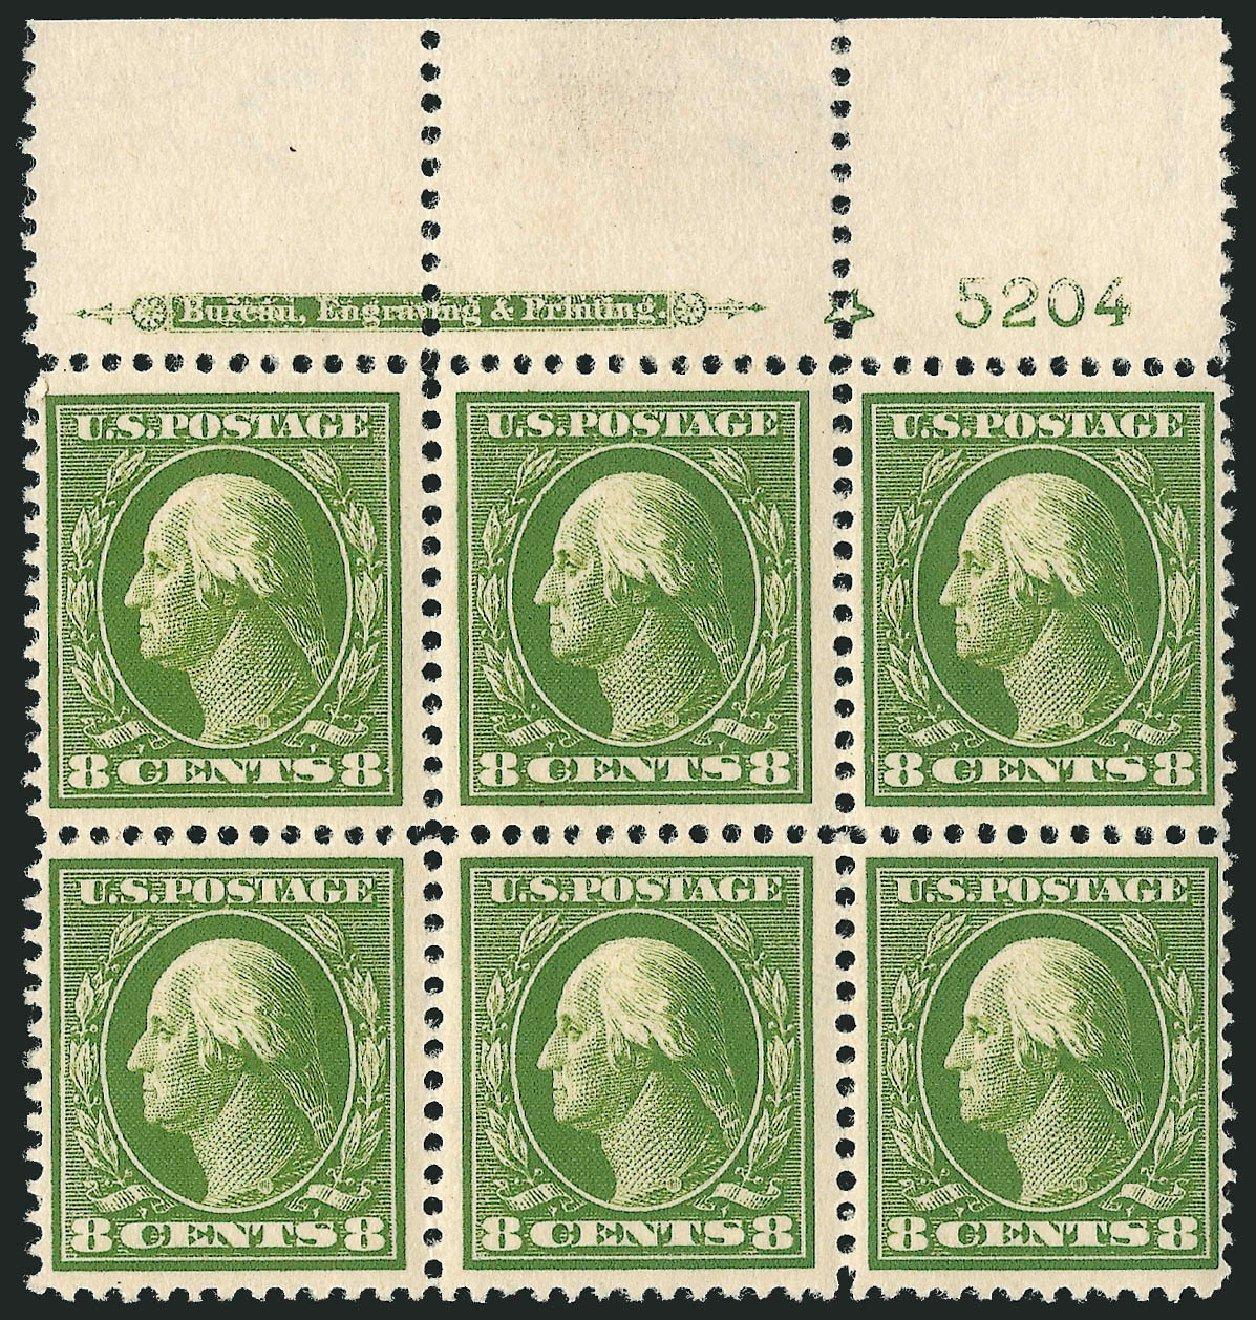 Costs of US Stamps Scott Catalogue 380: 8c 1911 Washington Perf 12. Robert Siegel Auction Galleries, Apr 2015, Sale 1096, Lot 623